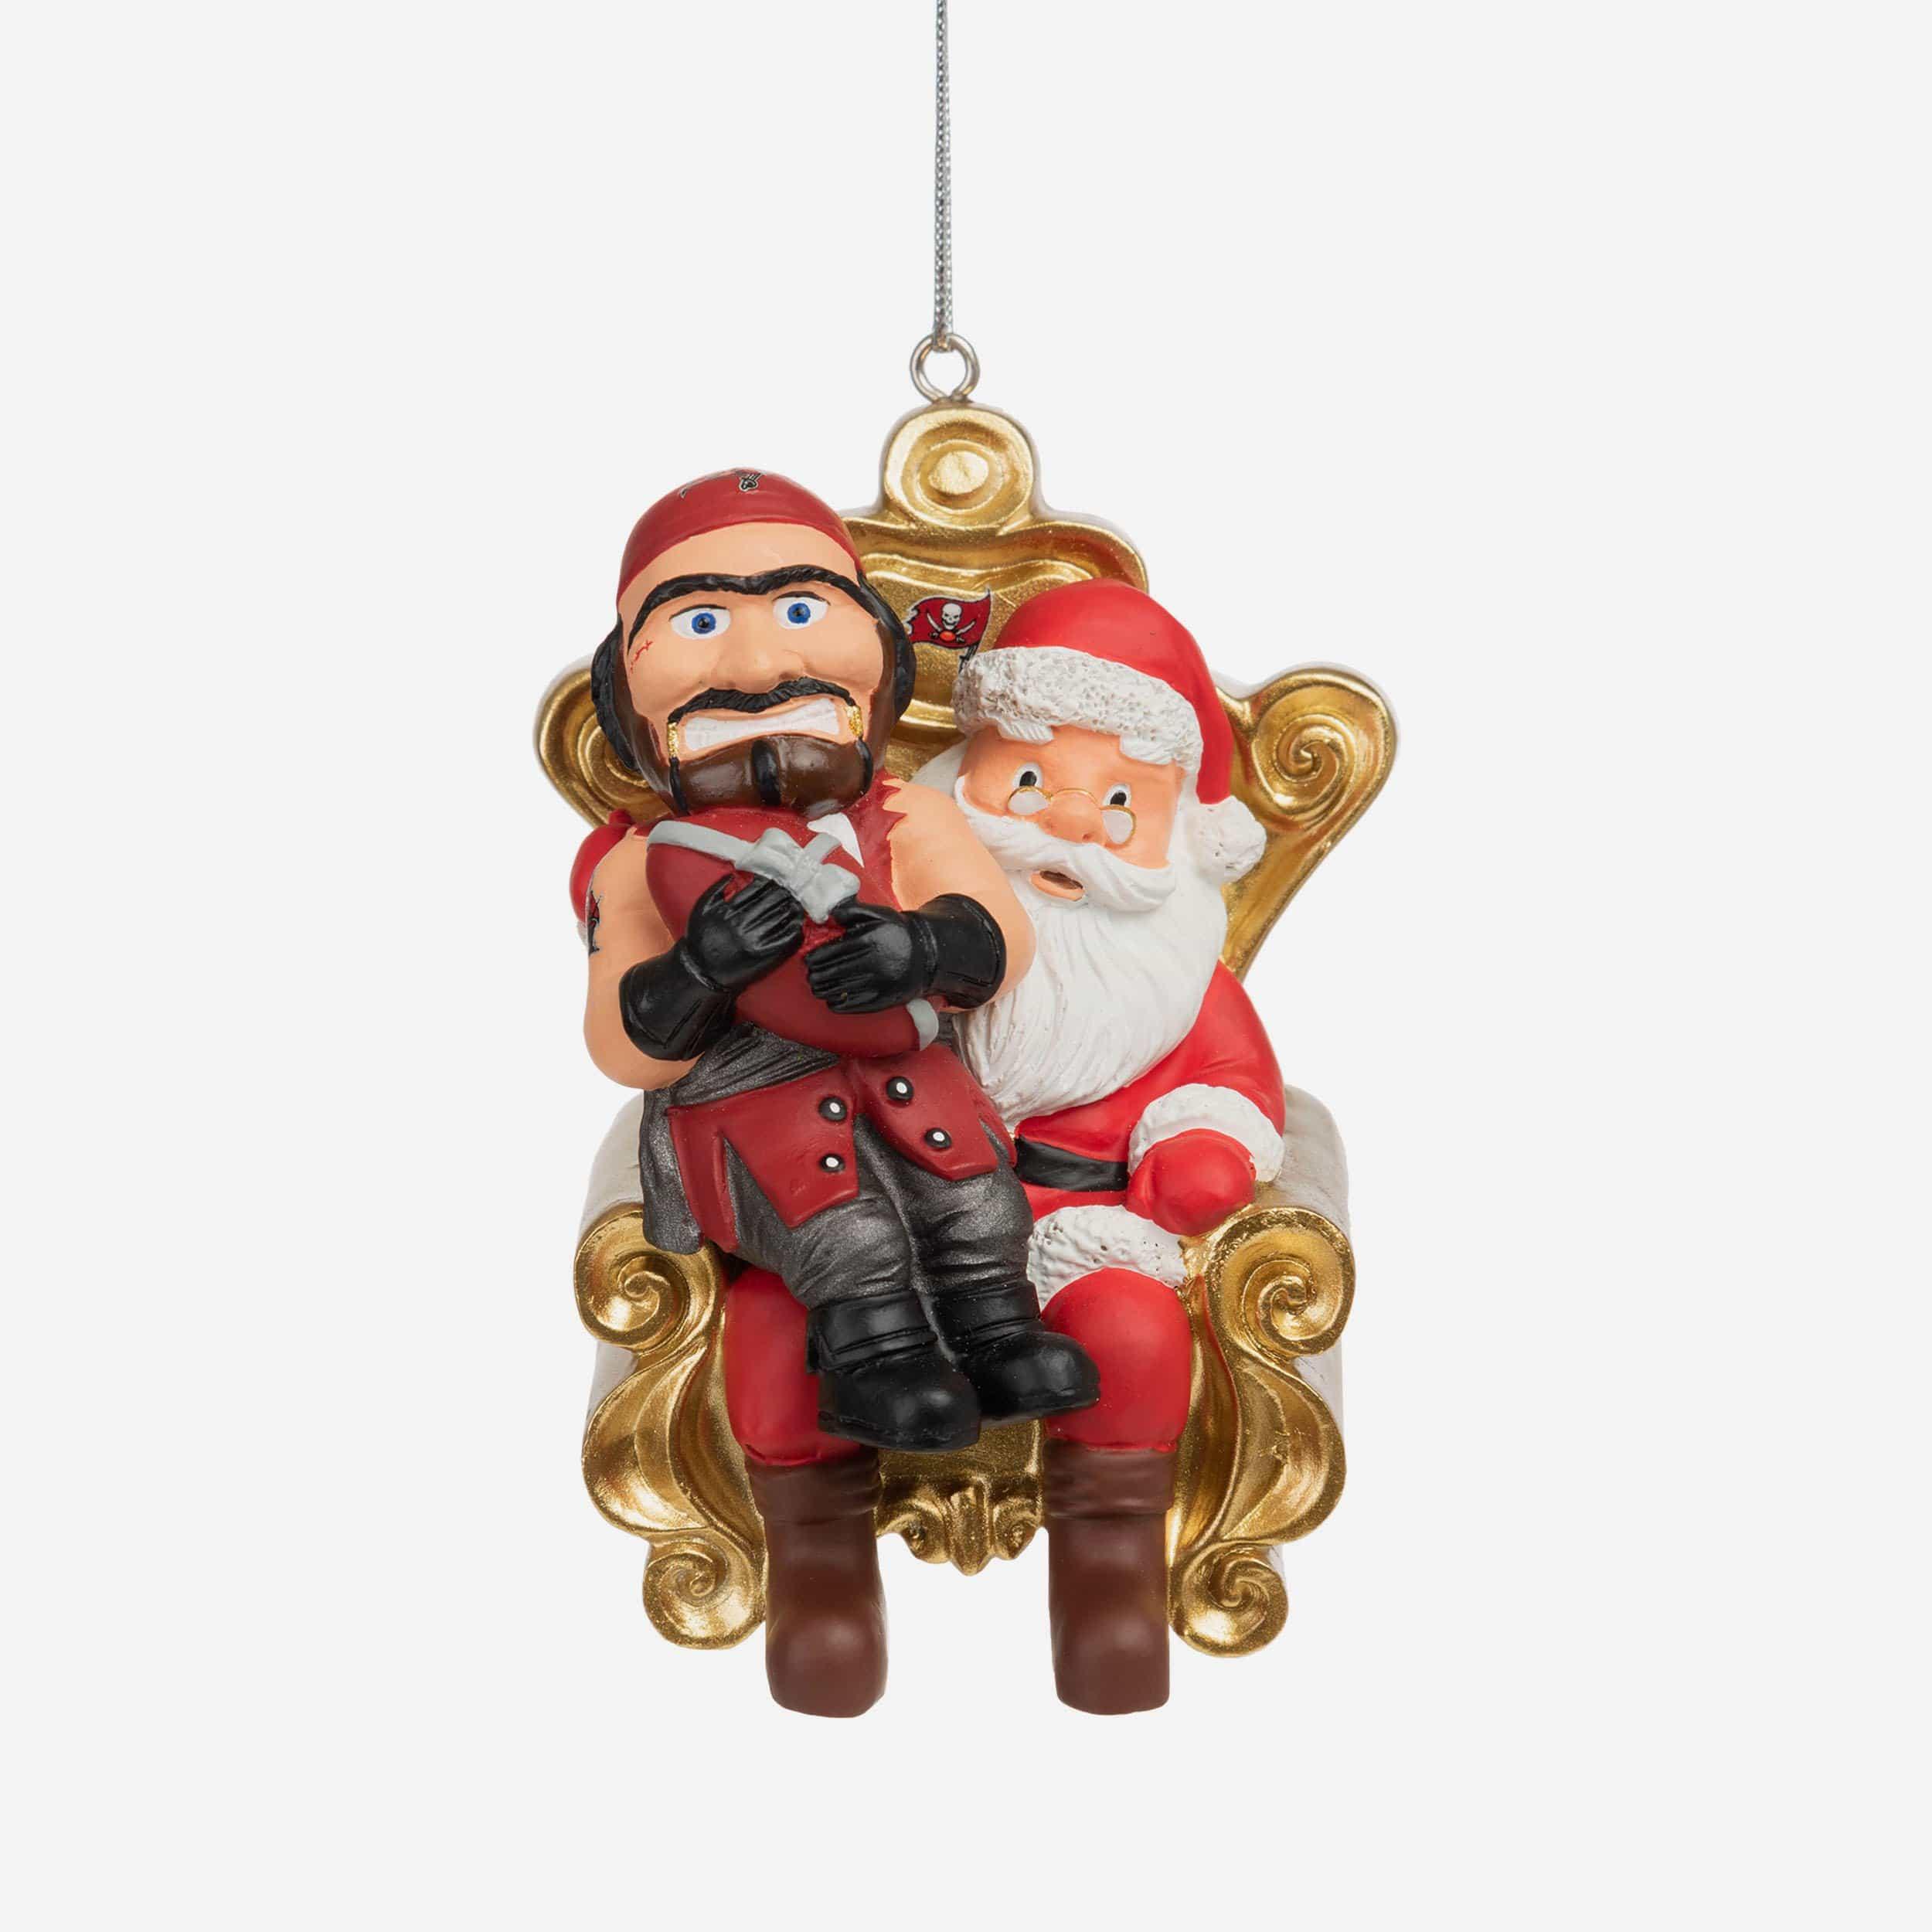 FOCO Captain Fear Tampa Bay Buccaneers Mascot On Santa's Lap Ornament